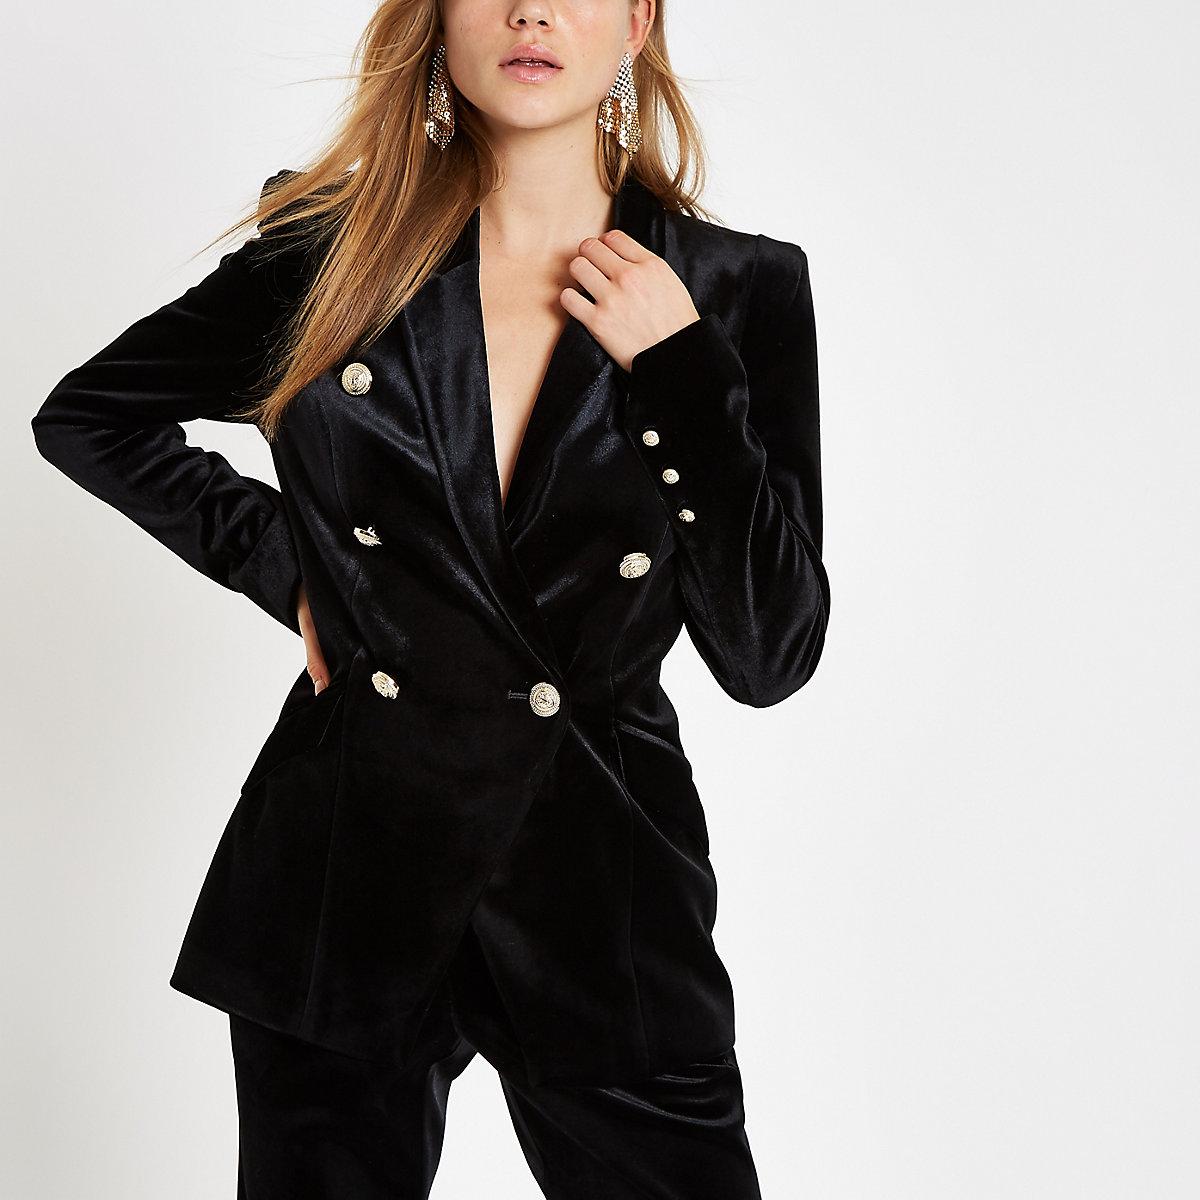 Black velvet tux jacket